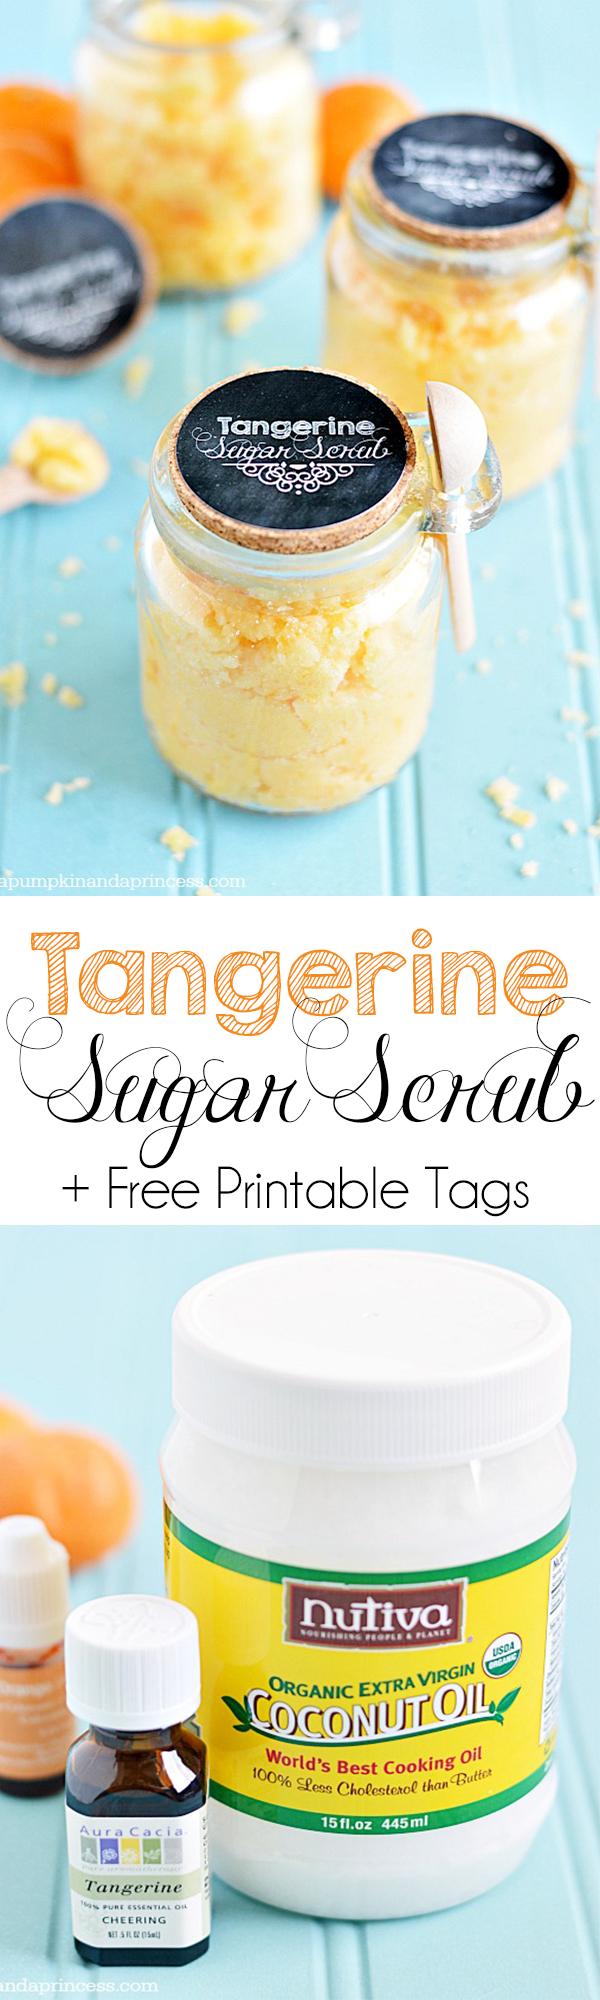 Tropical Sugar Scrub Recipe